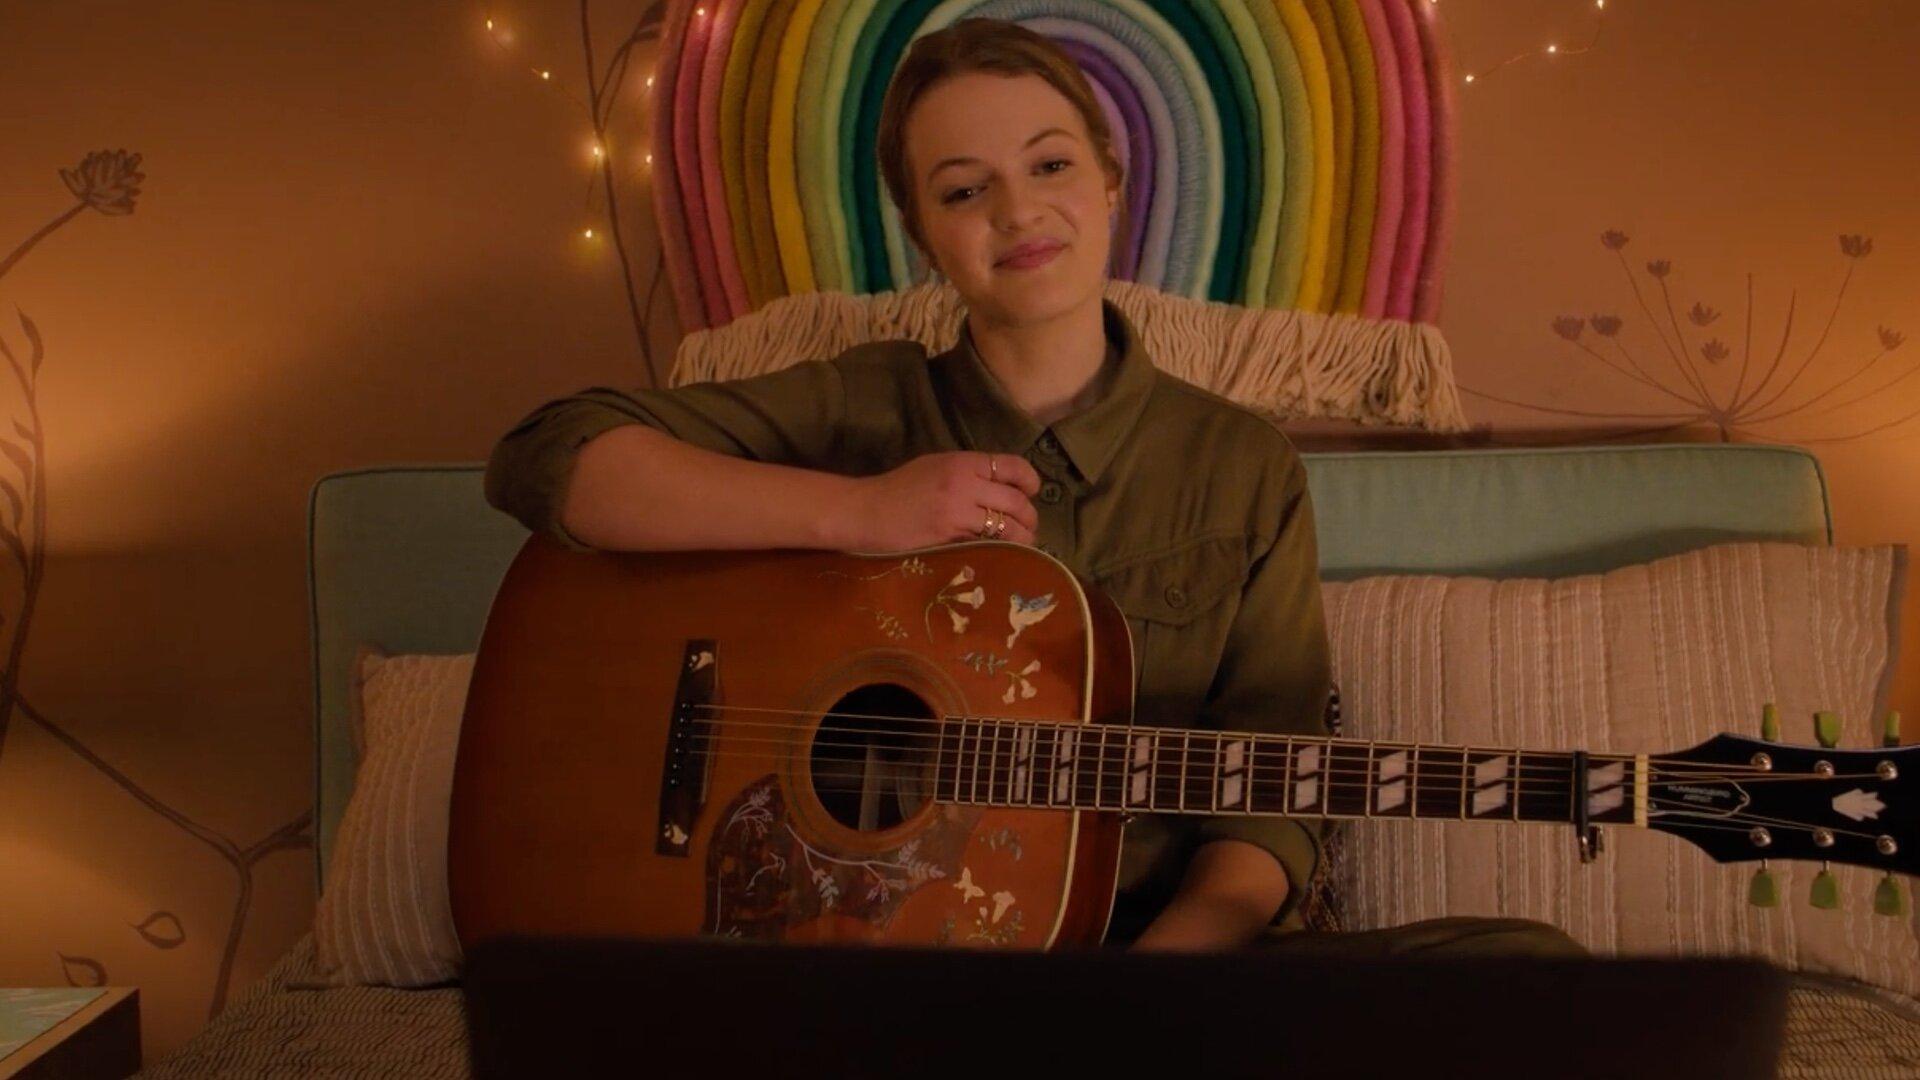 New Trailer For Ryan Murphy's Netflix Musical THE PROM with Meryl Streep, Nicole Kidman, and More — GeekTyrant